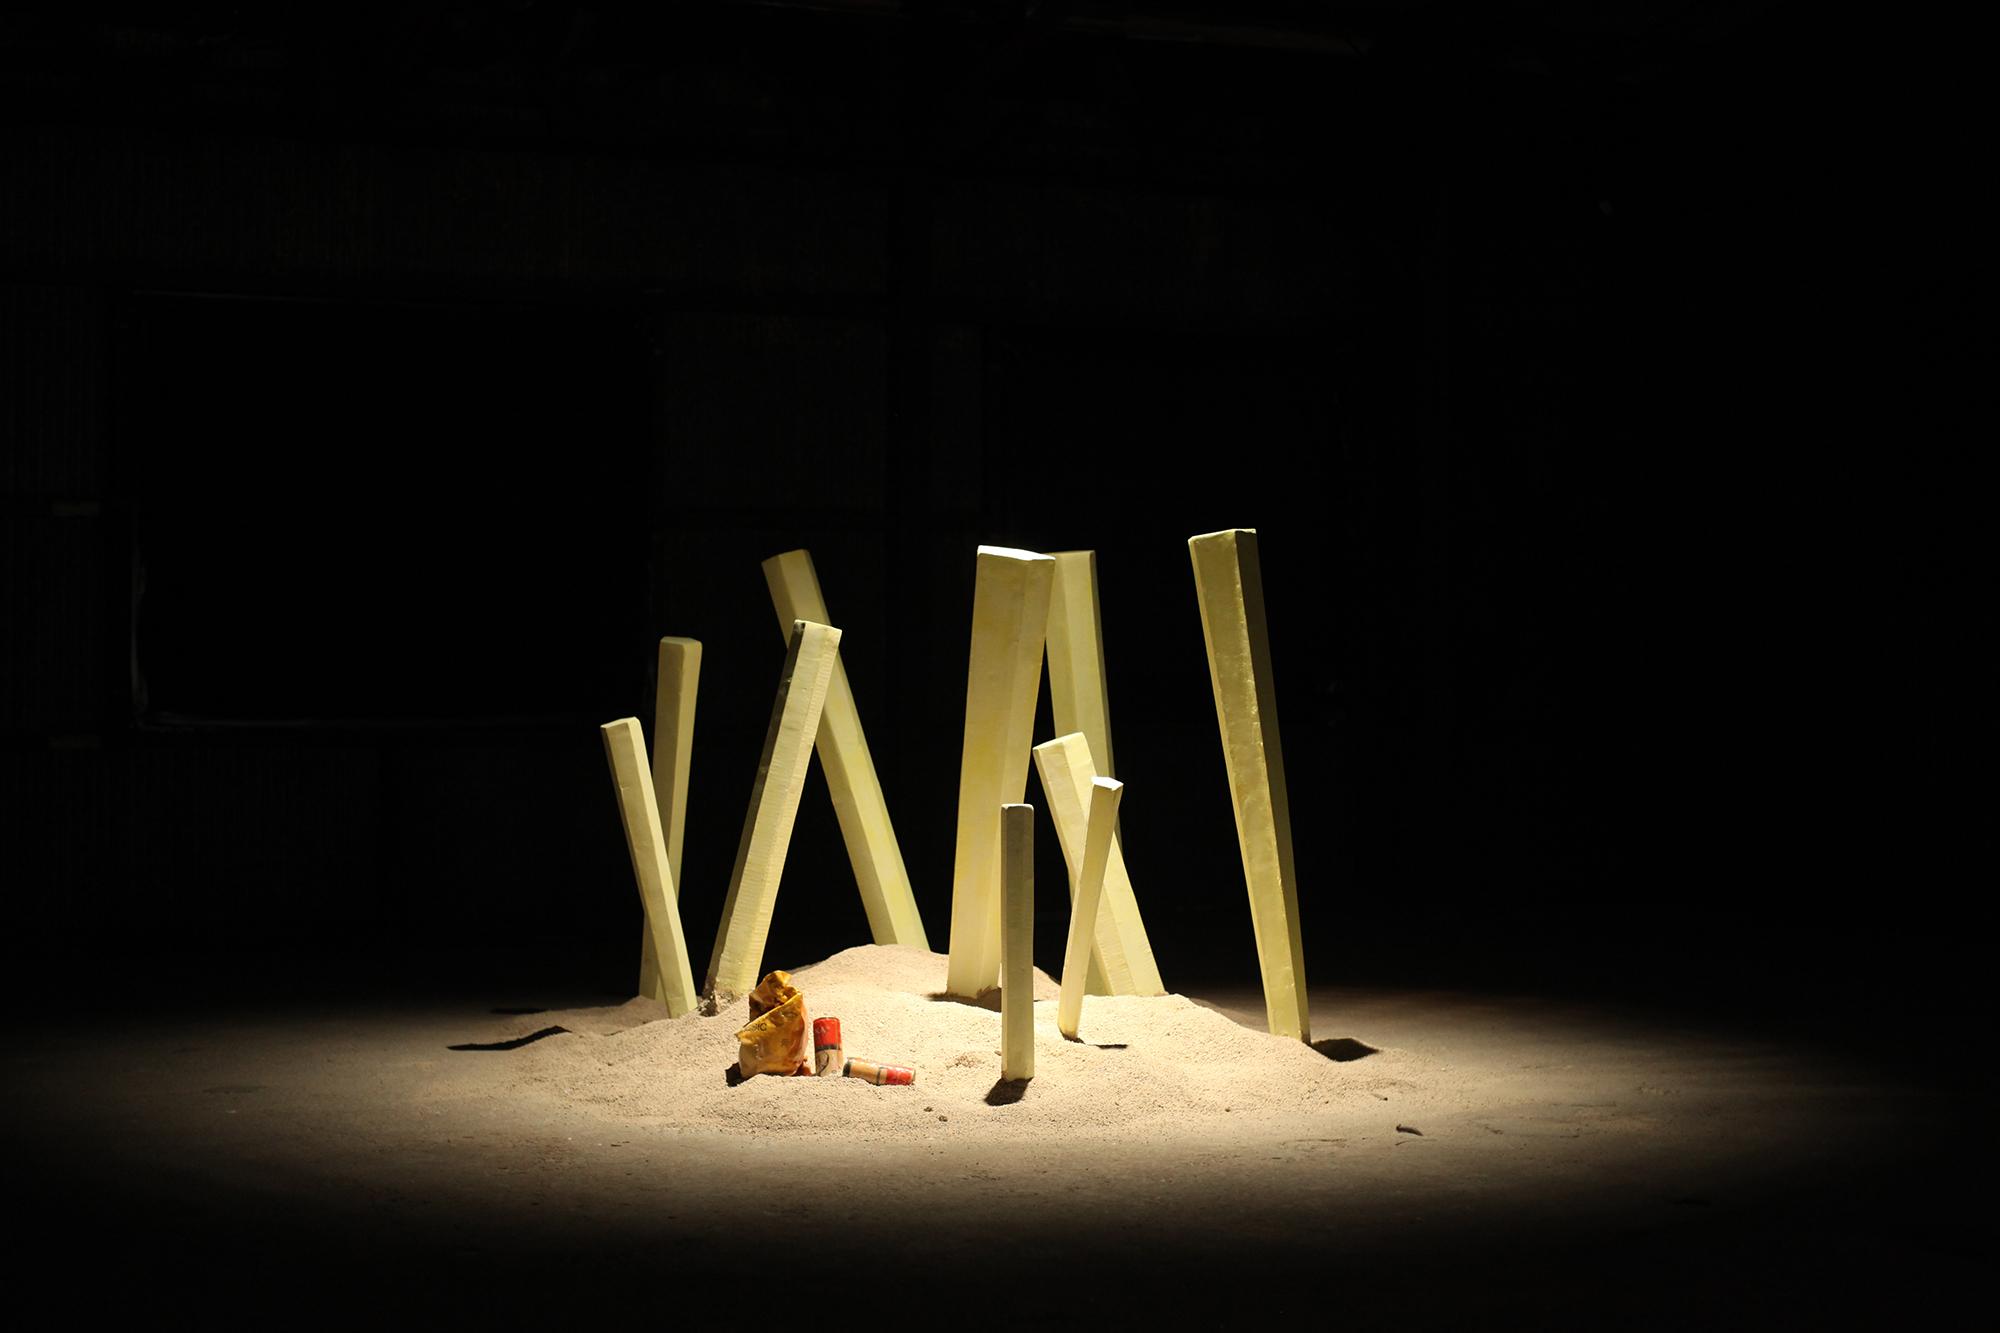 my village is your village, and is mine 2017  300cm x 142cm x300cm  carton box,sand,wire